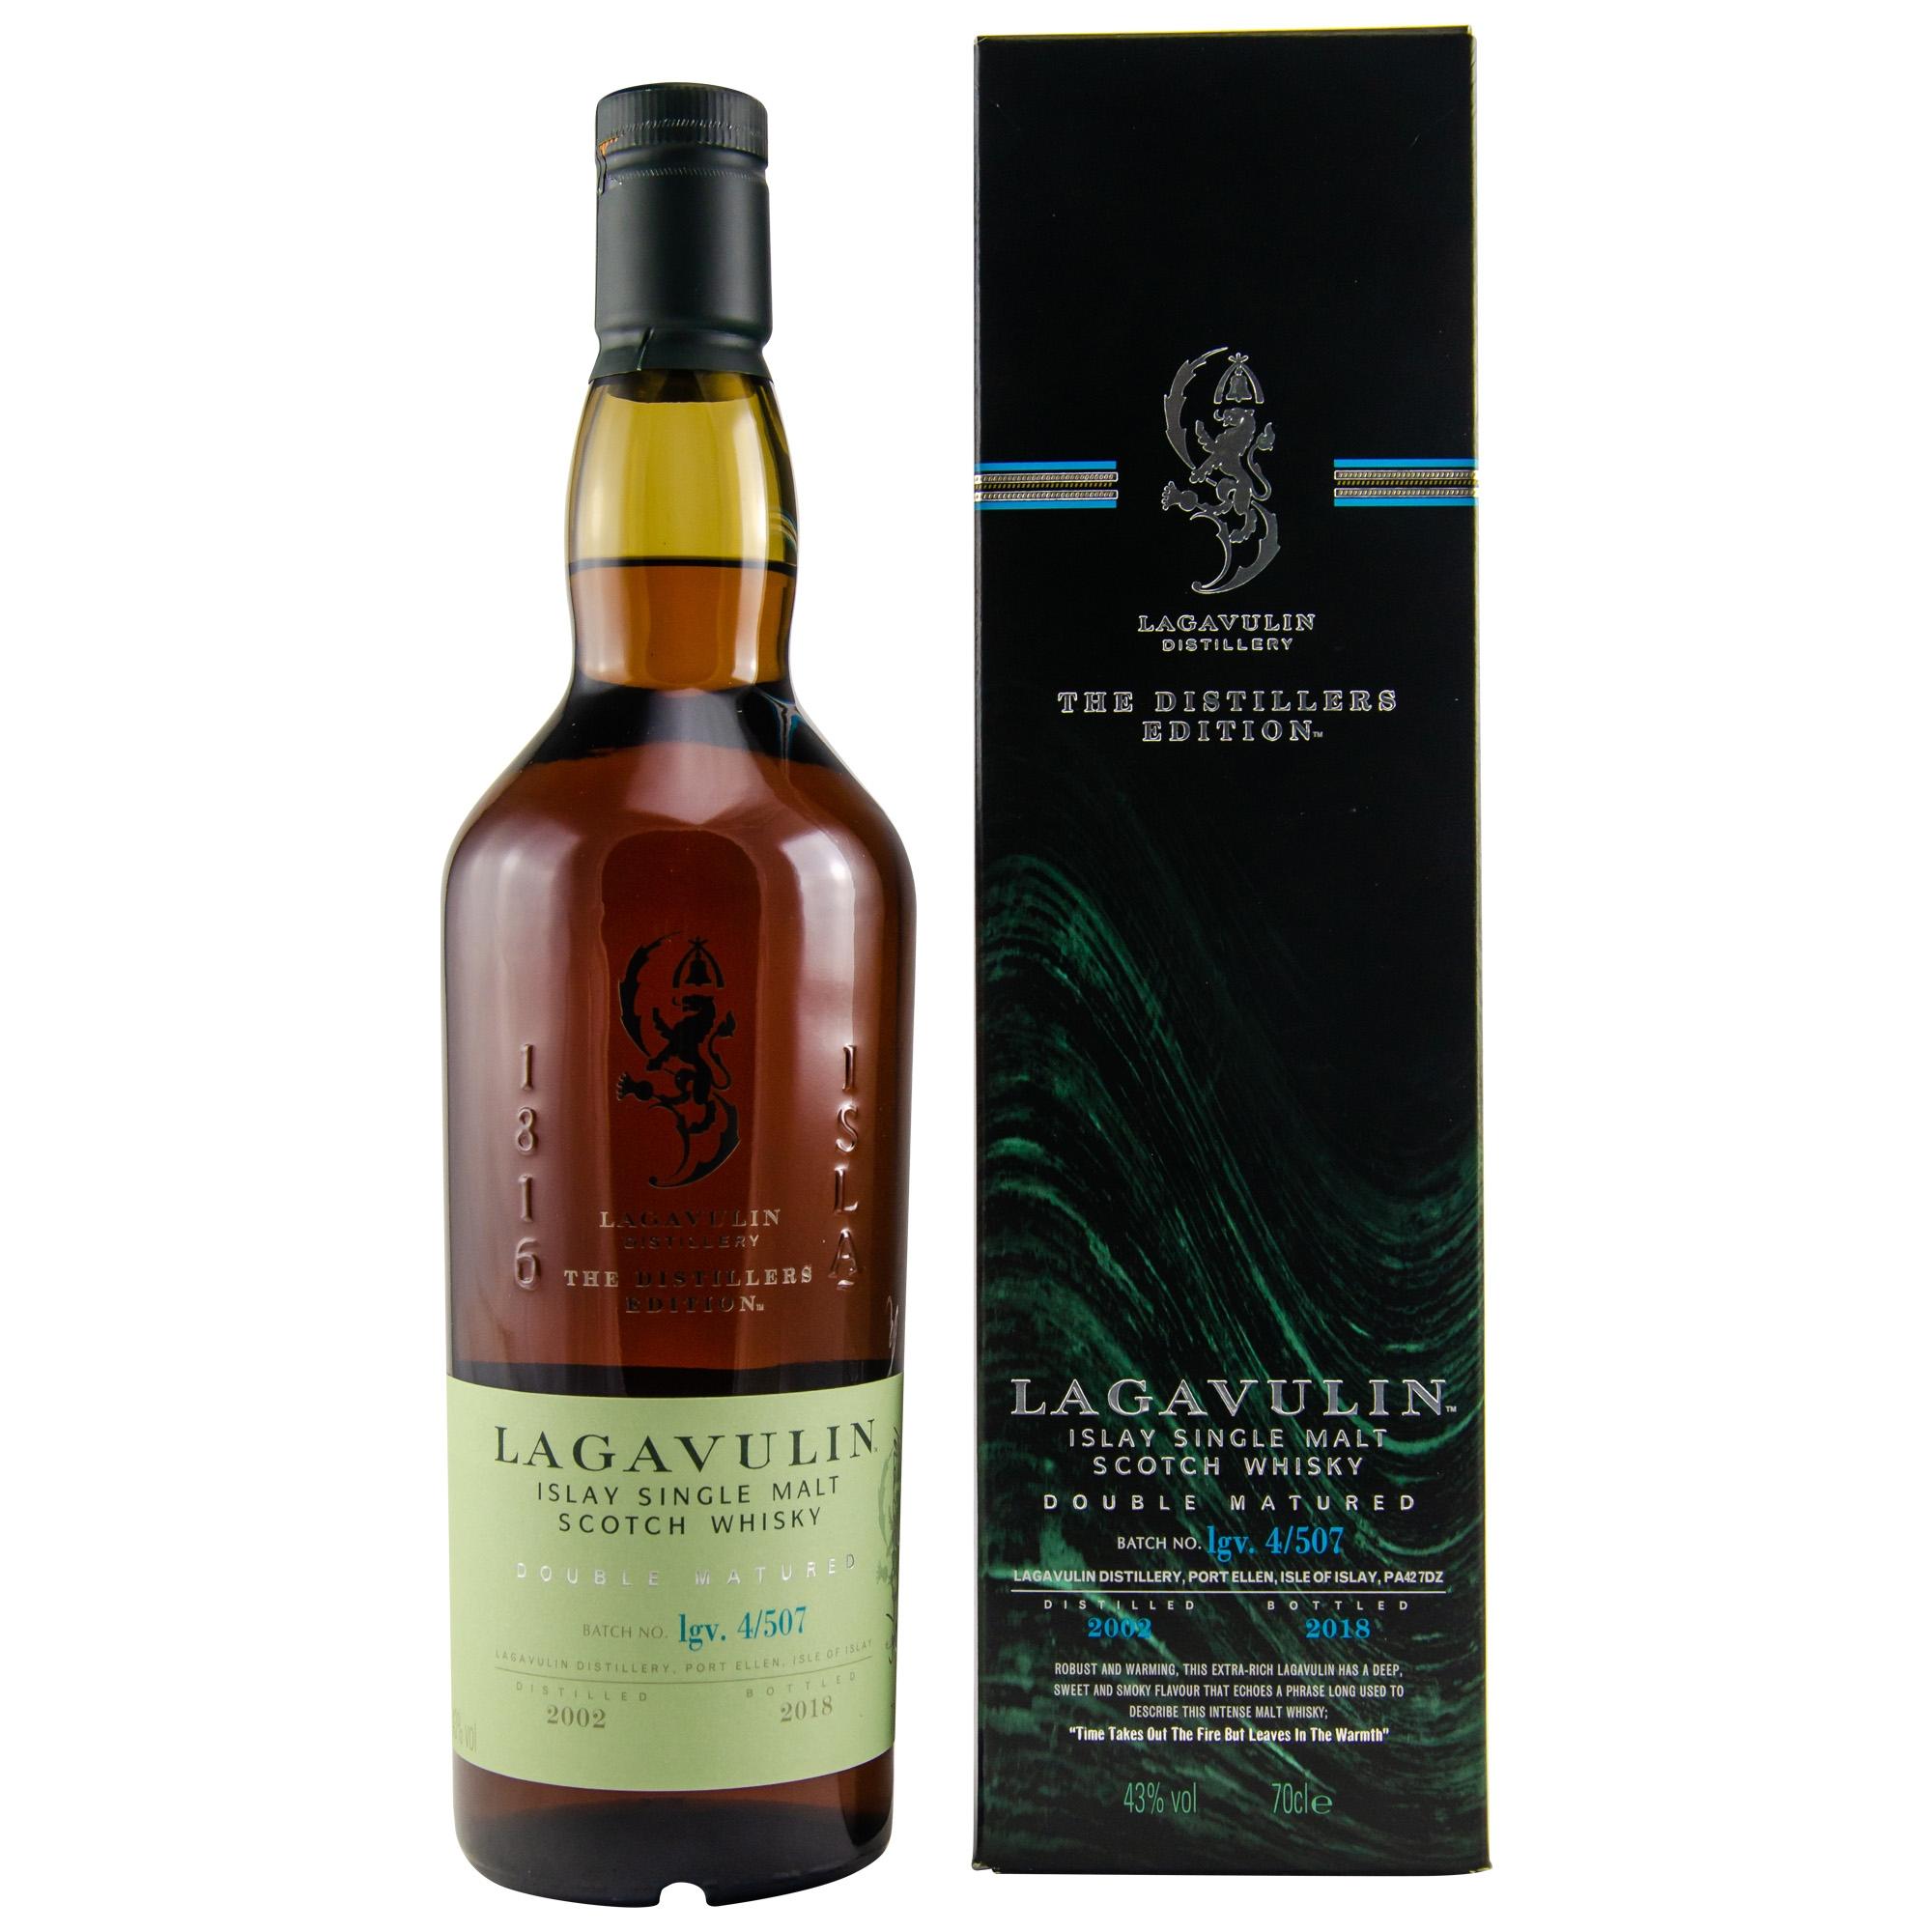 Lagavulin Distillers Edition 2002/2018, Talisker Port Ruighe, AnCnoc 24 Single Malt Whisky